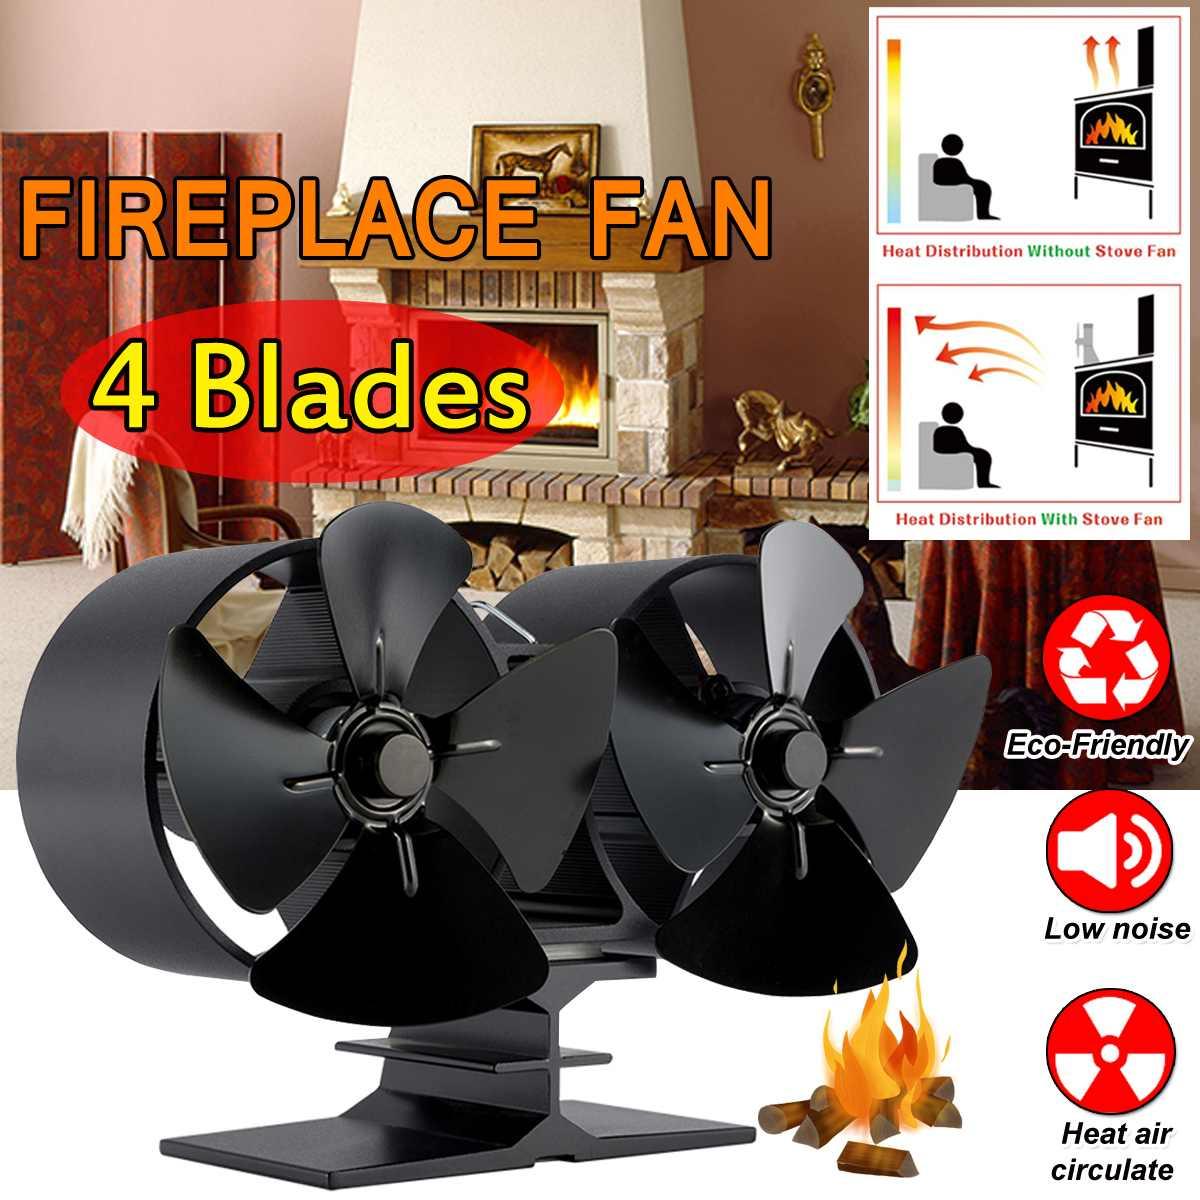 Single/Double New Head Black Stove Fan 4 Blade Fireplace Fan Heat Powered Wood Burner Efficient Quiet Home Heat Distribution